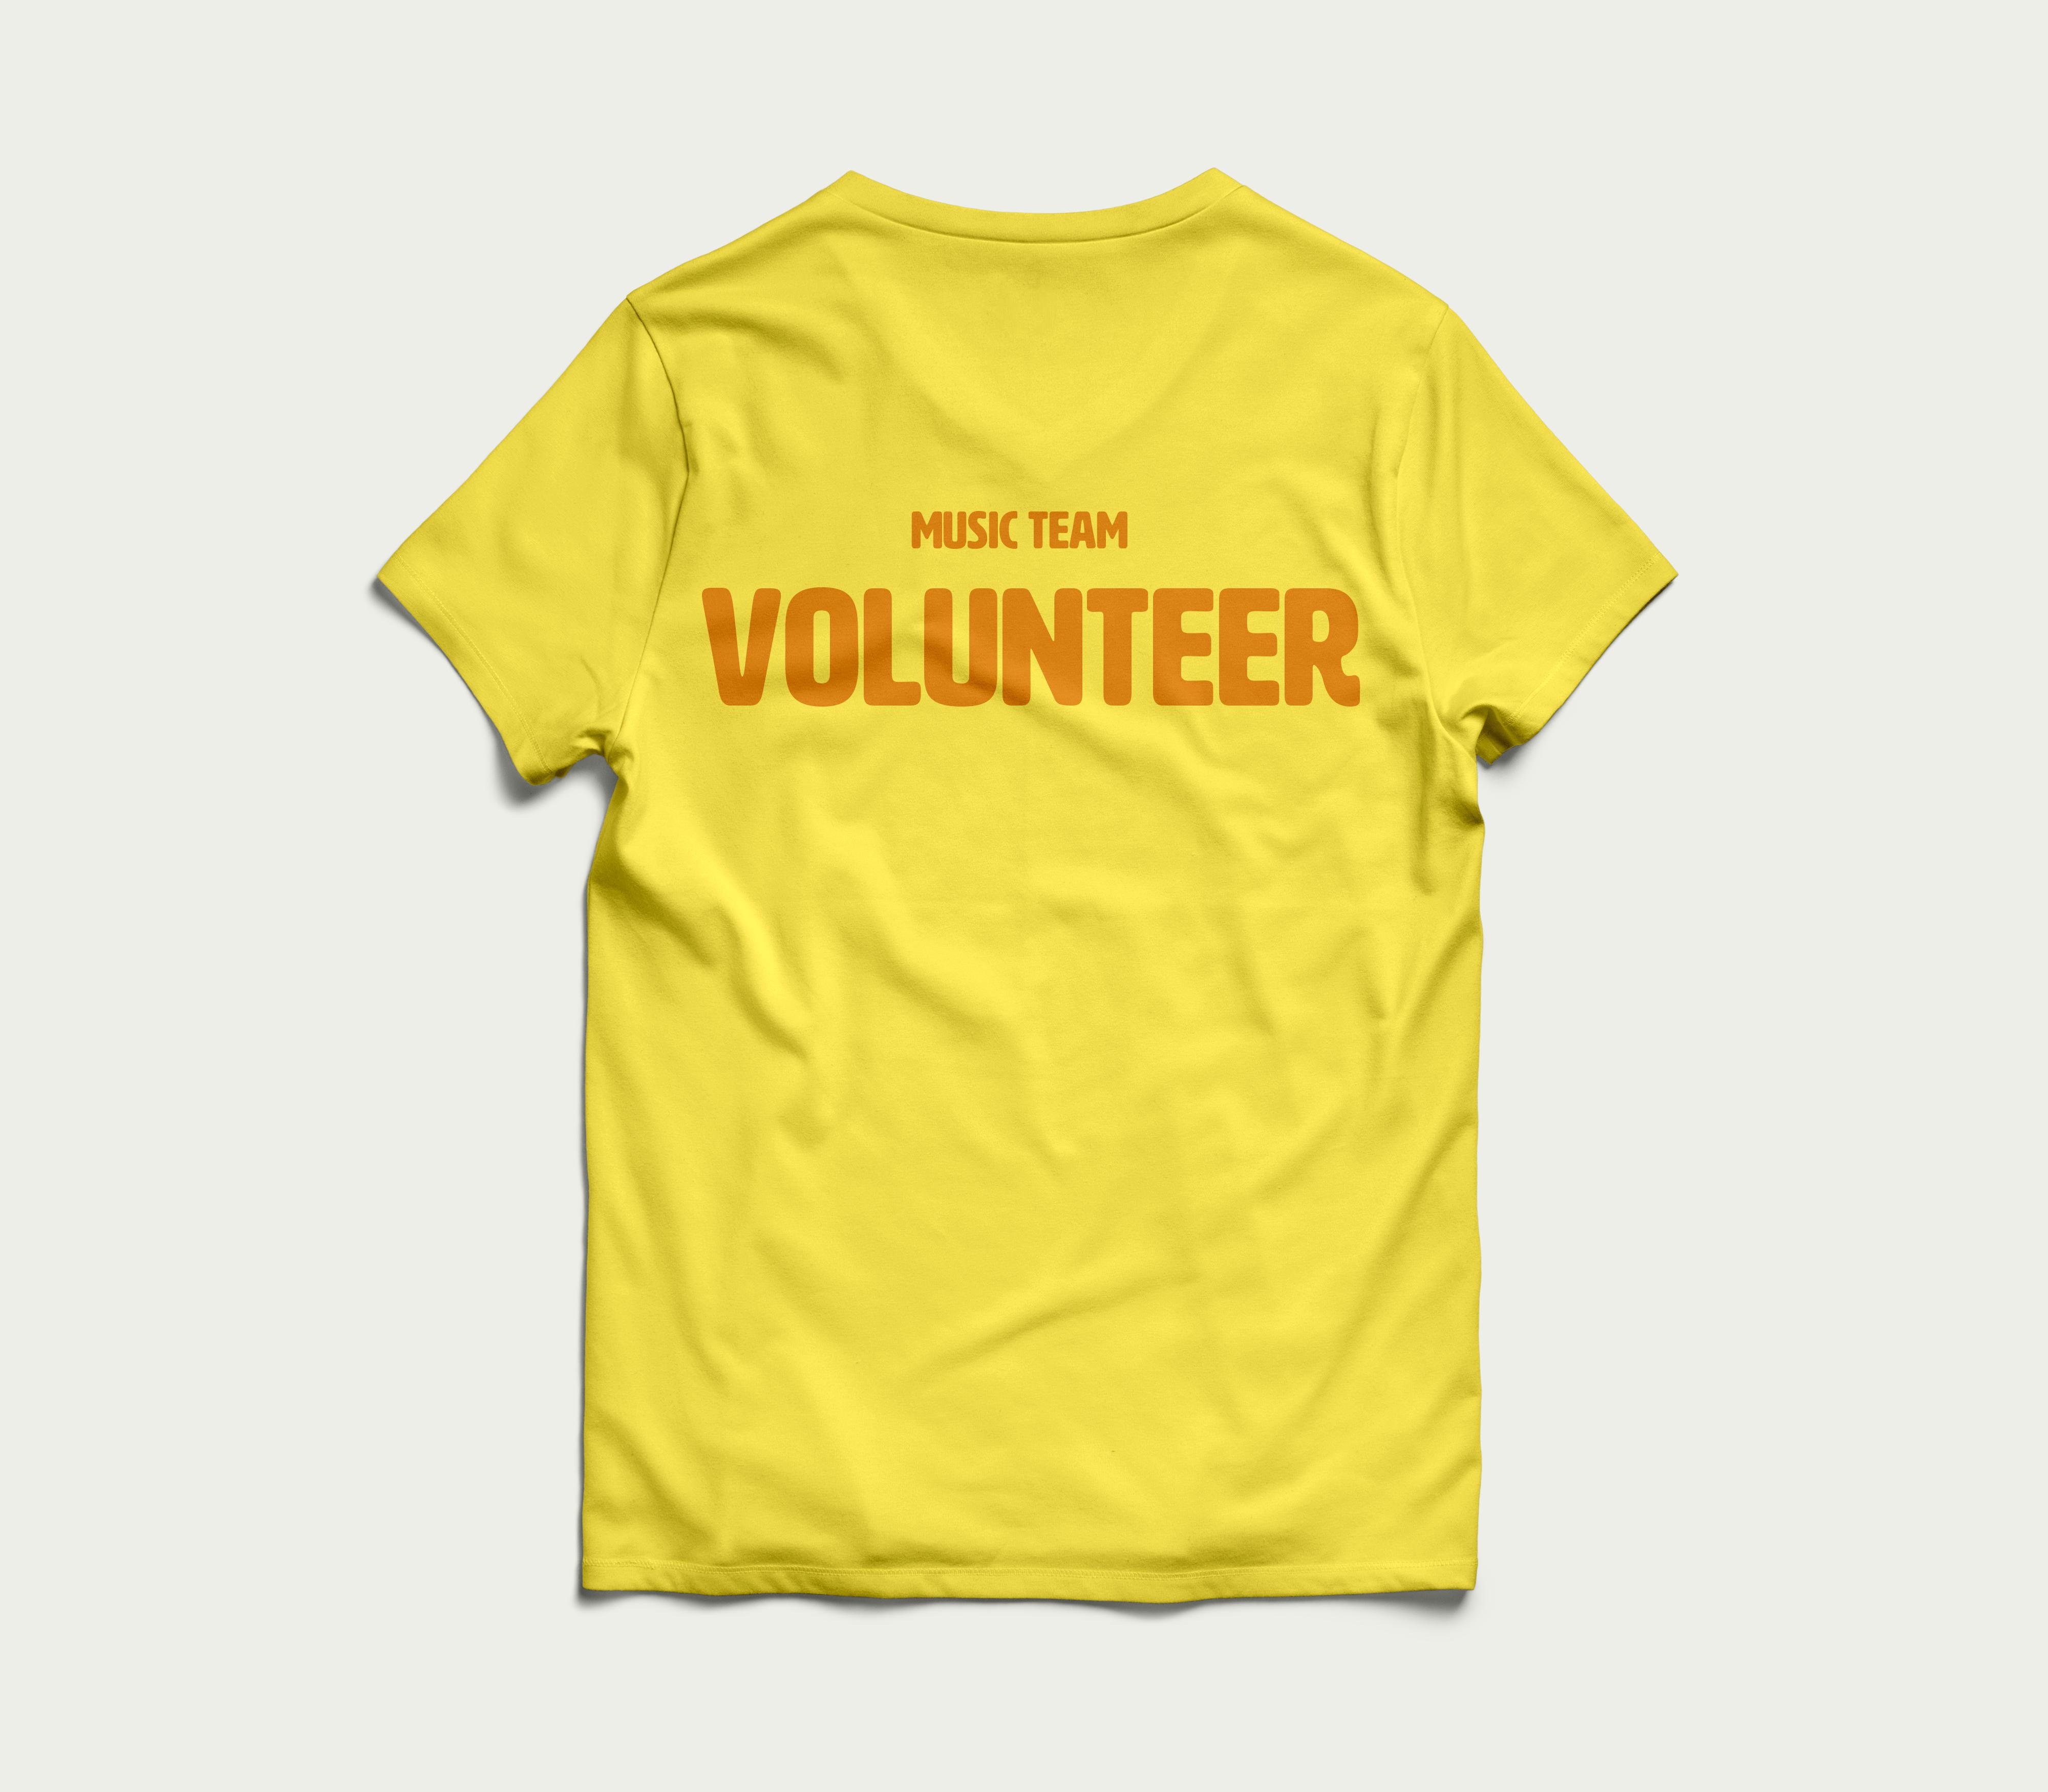 music team volunteer shirt back